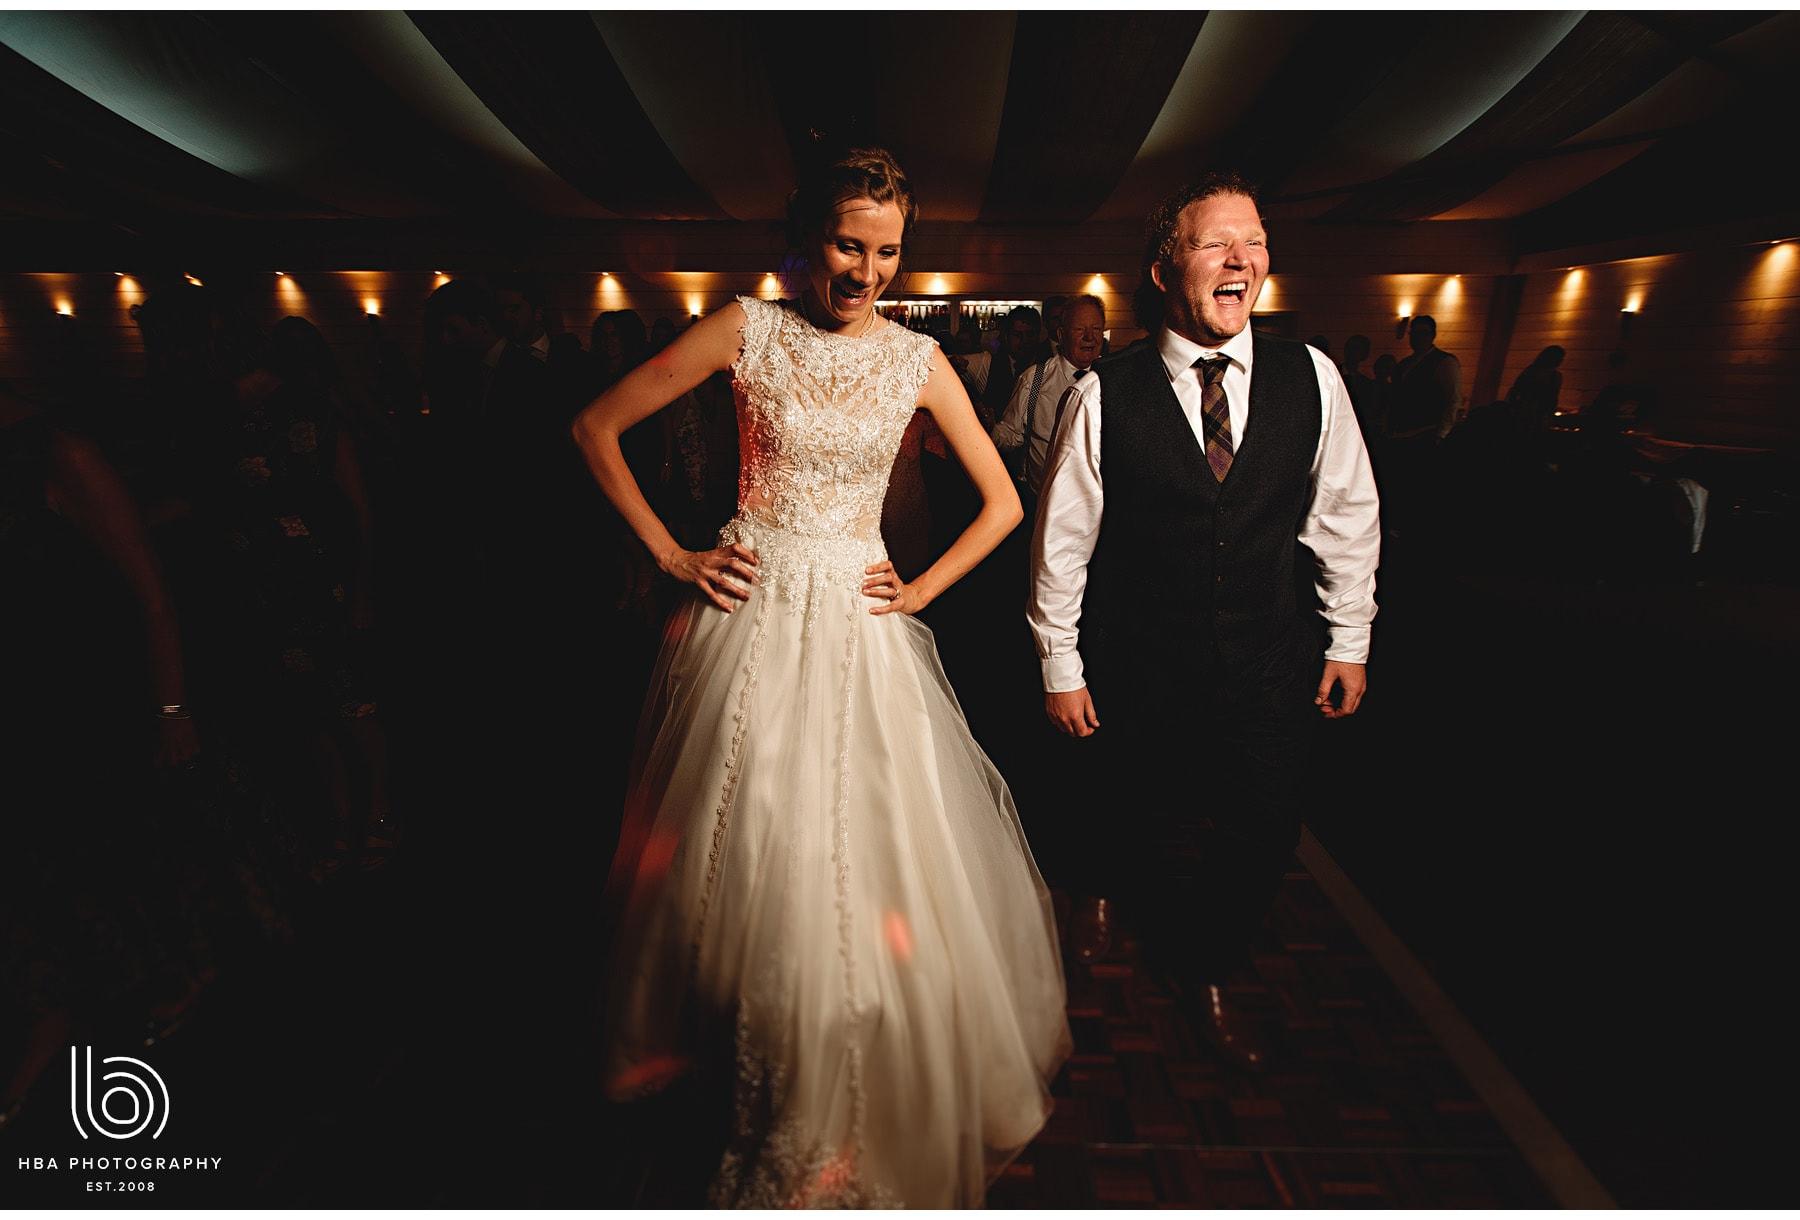 Newton_House_Barns_Summer_Wedding_Photos_by_Derbyshire_HBA_Photography_Photographers